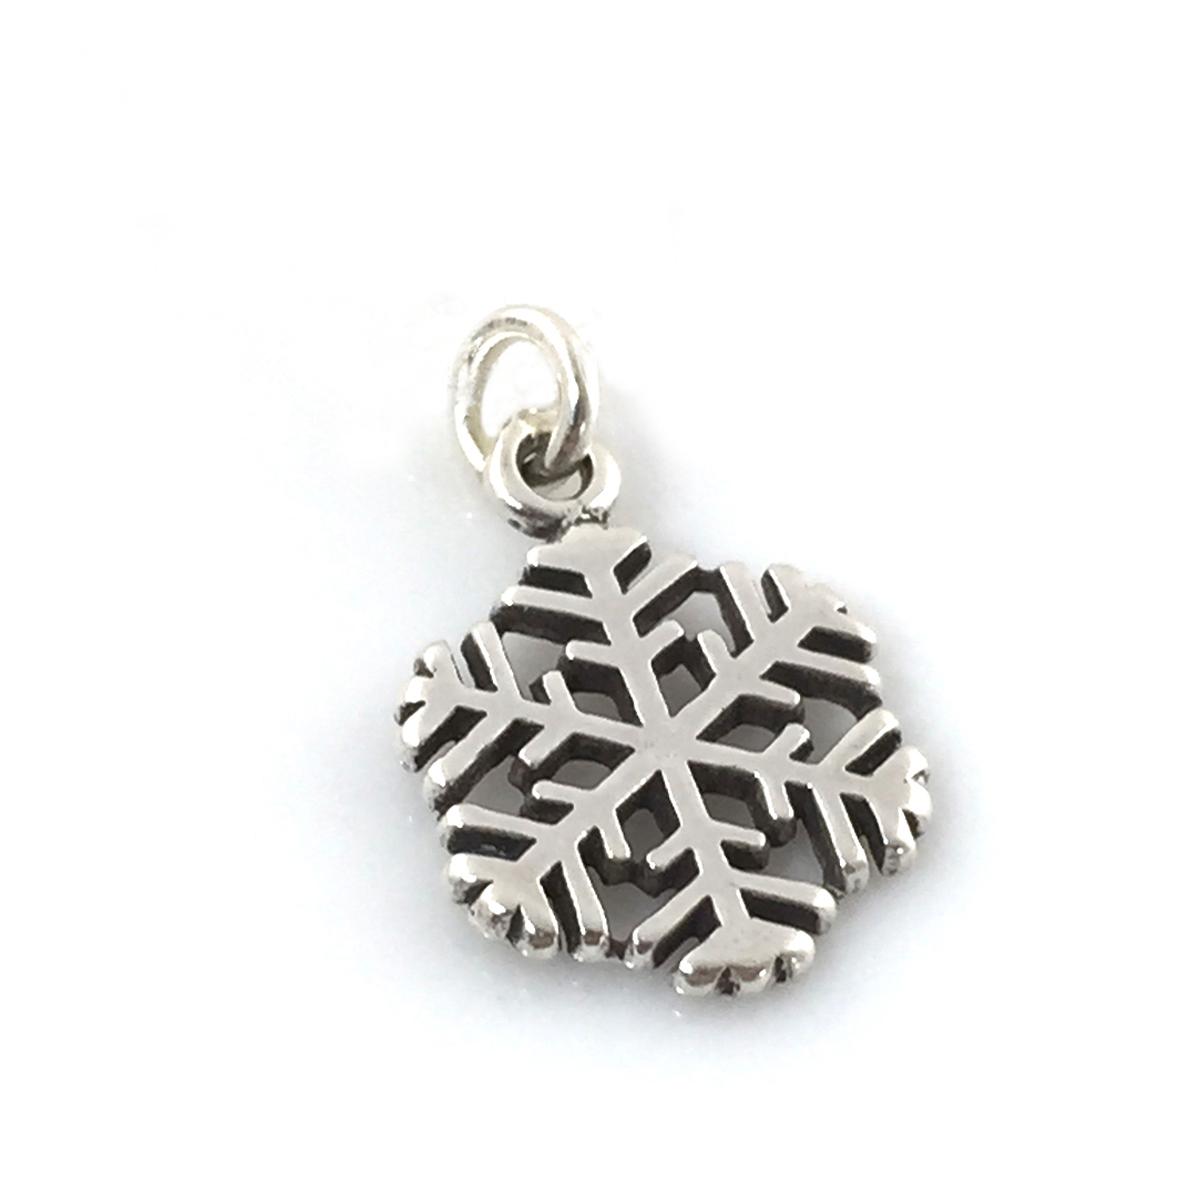 Add a Snowflake Charm